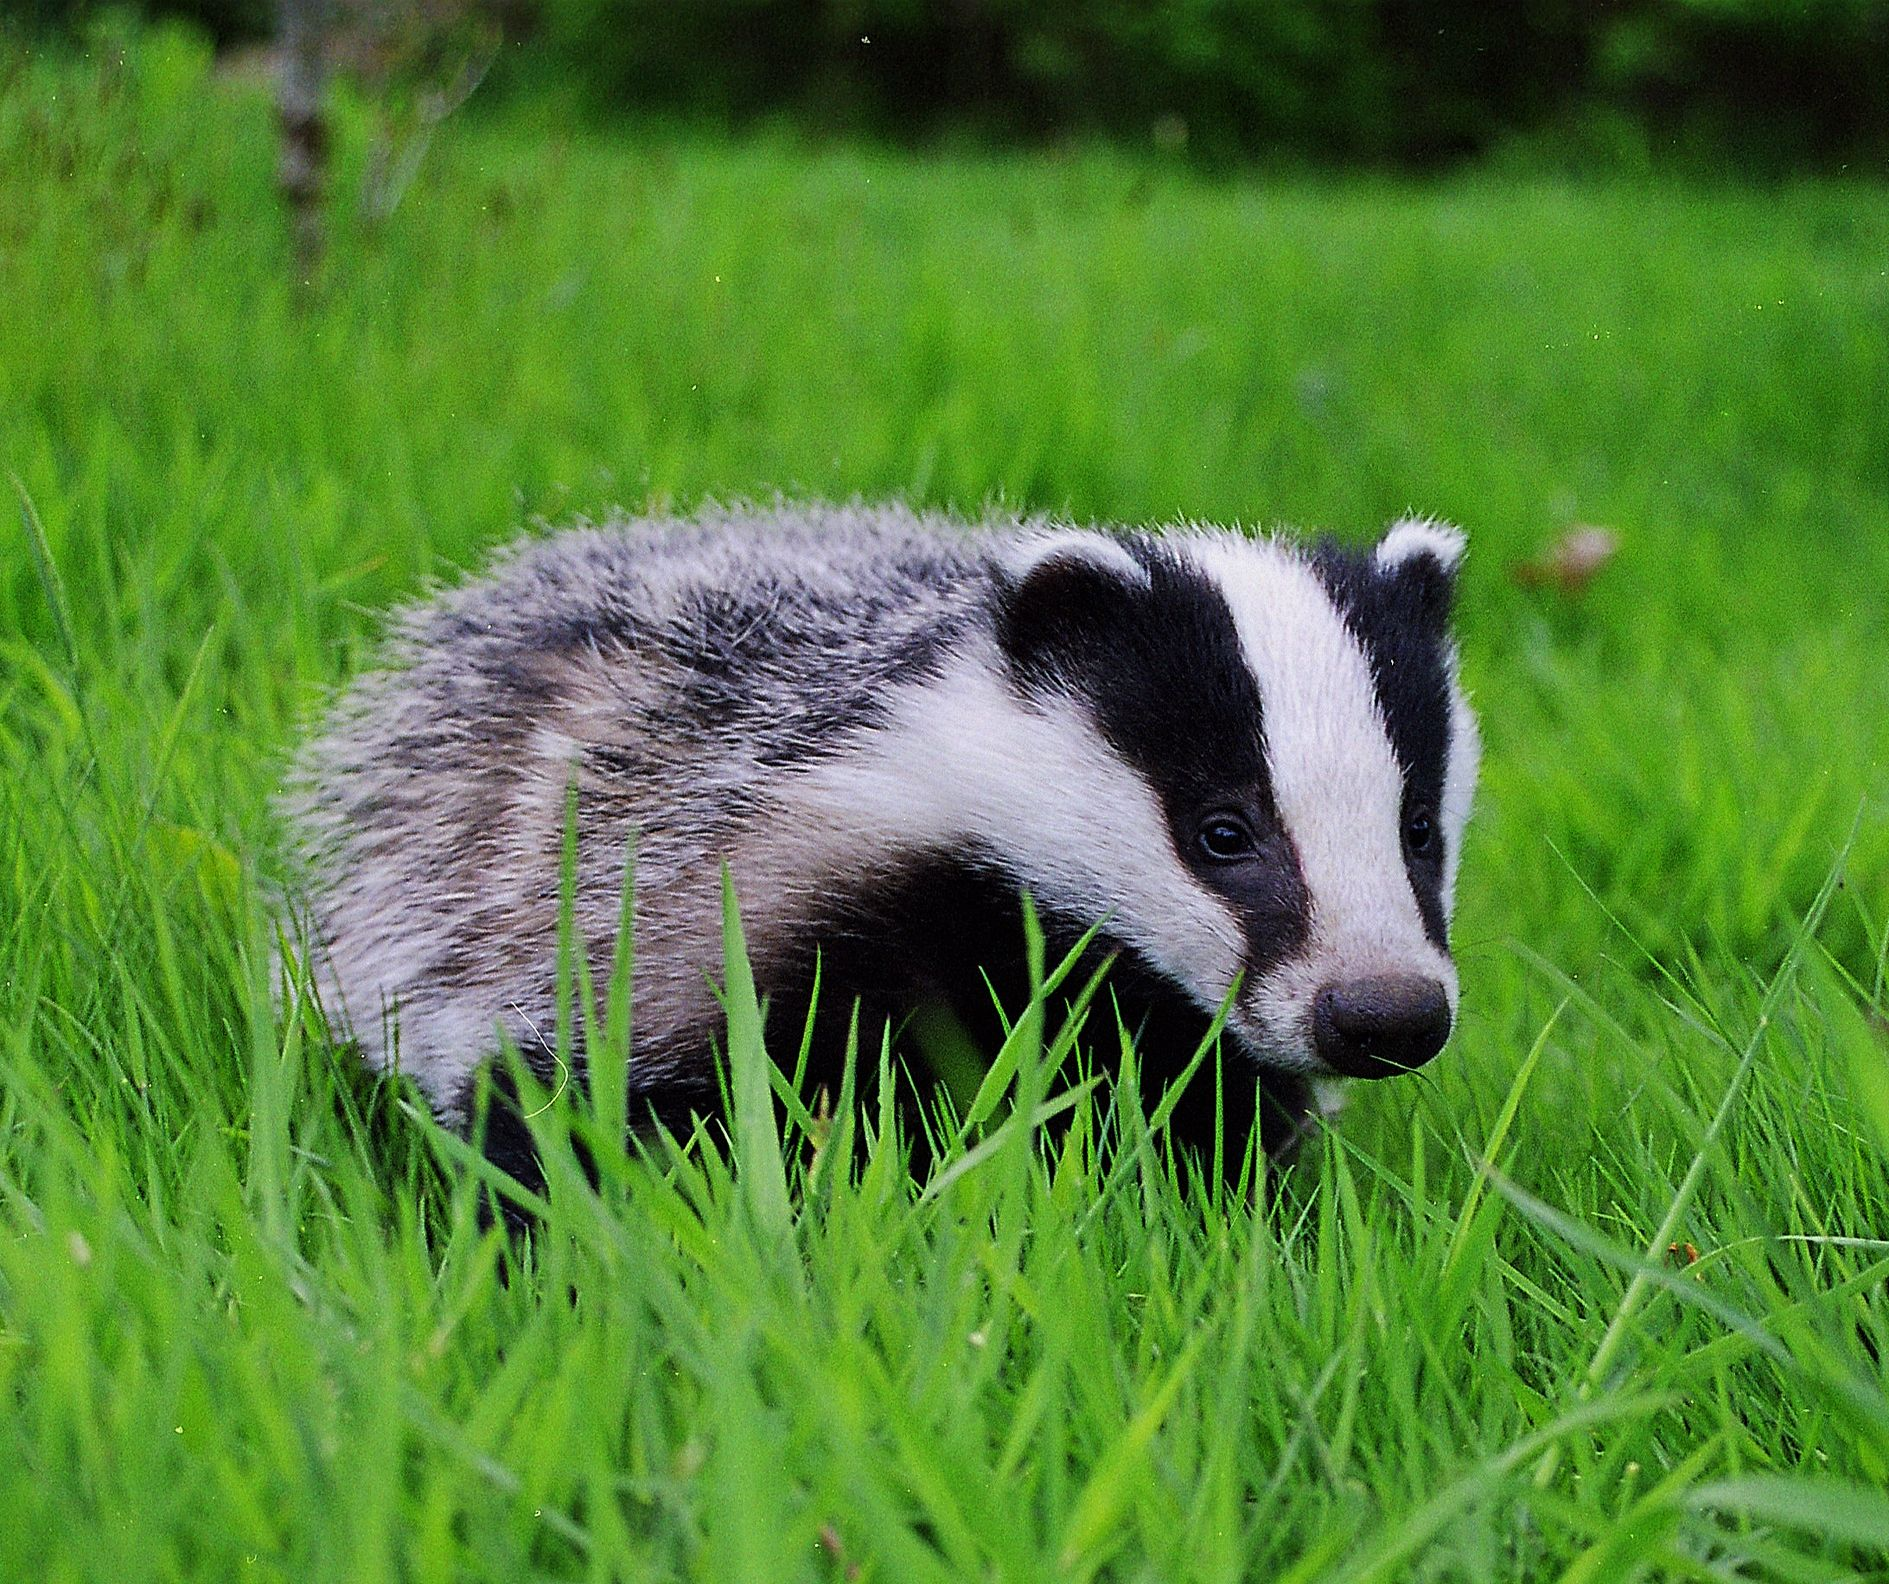 Honey badger (animal): description, photo and habitat 28